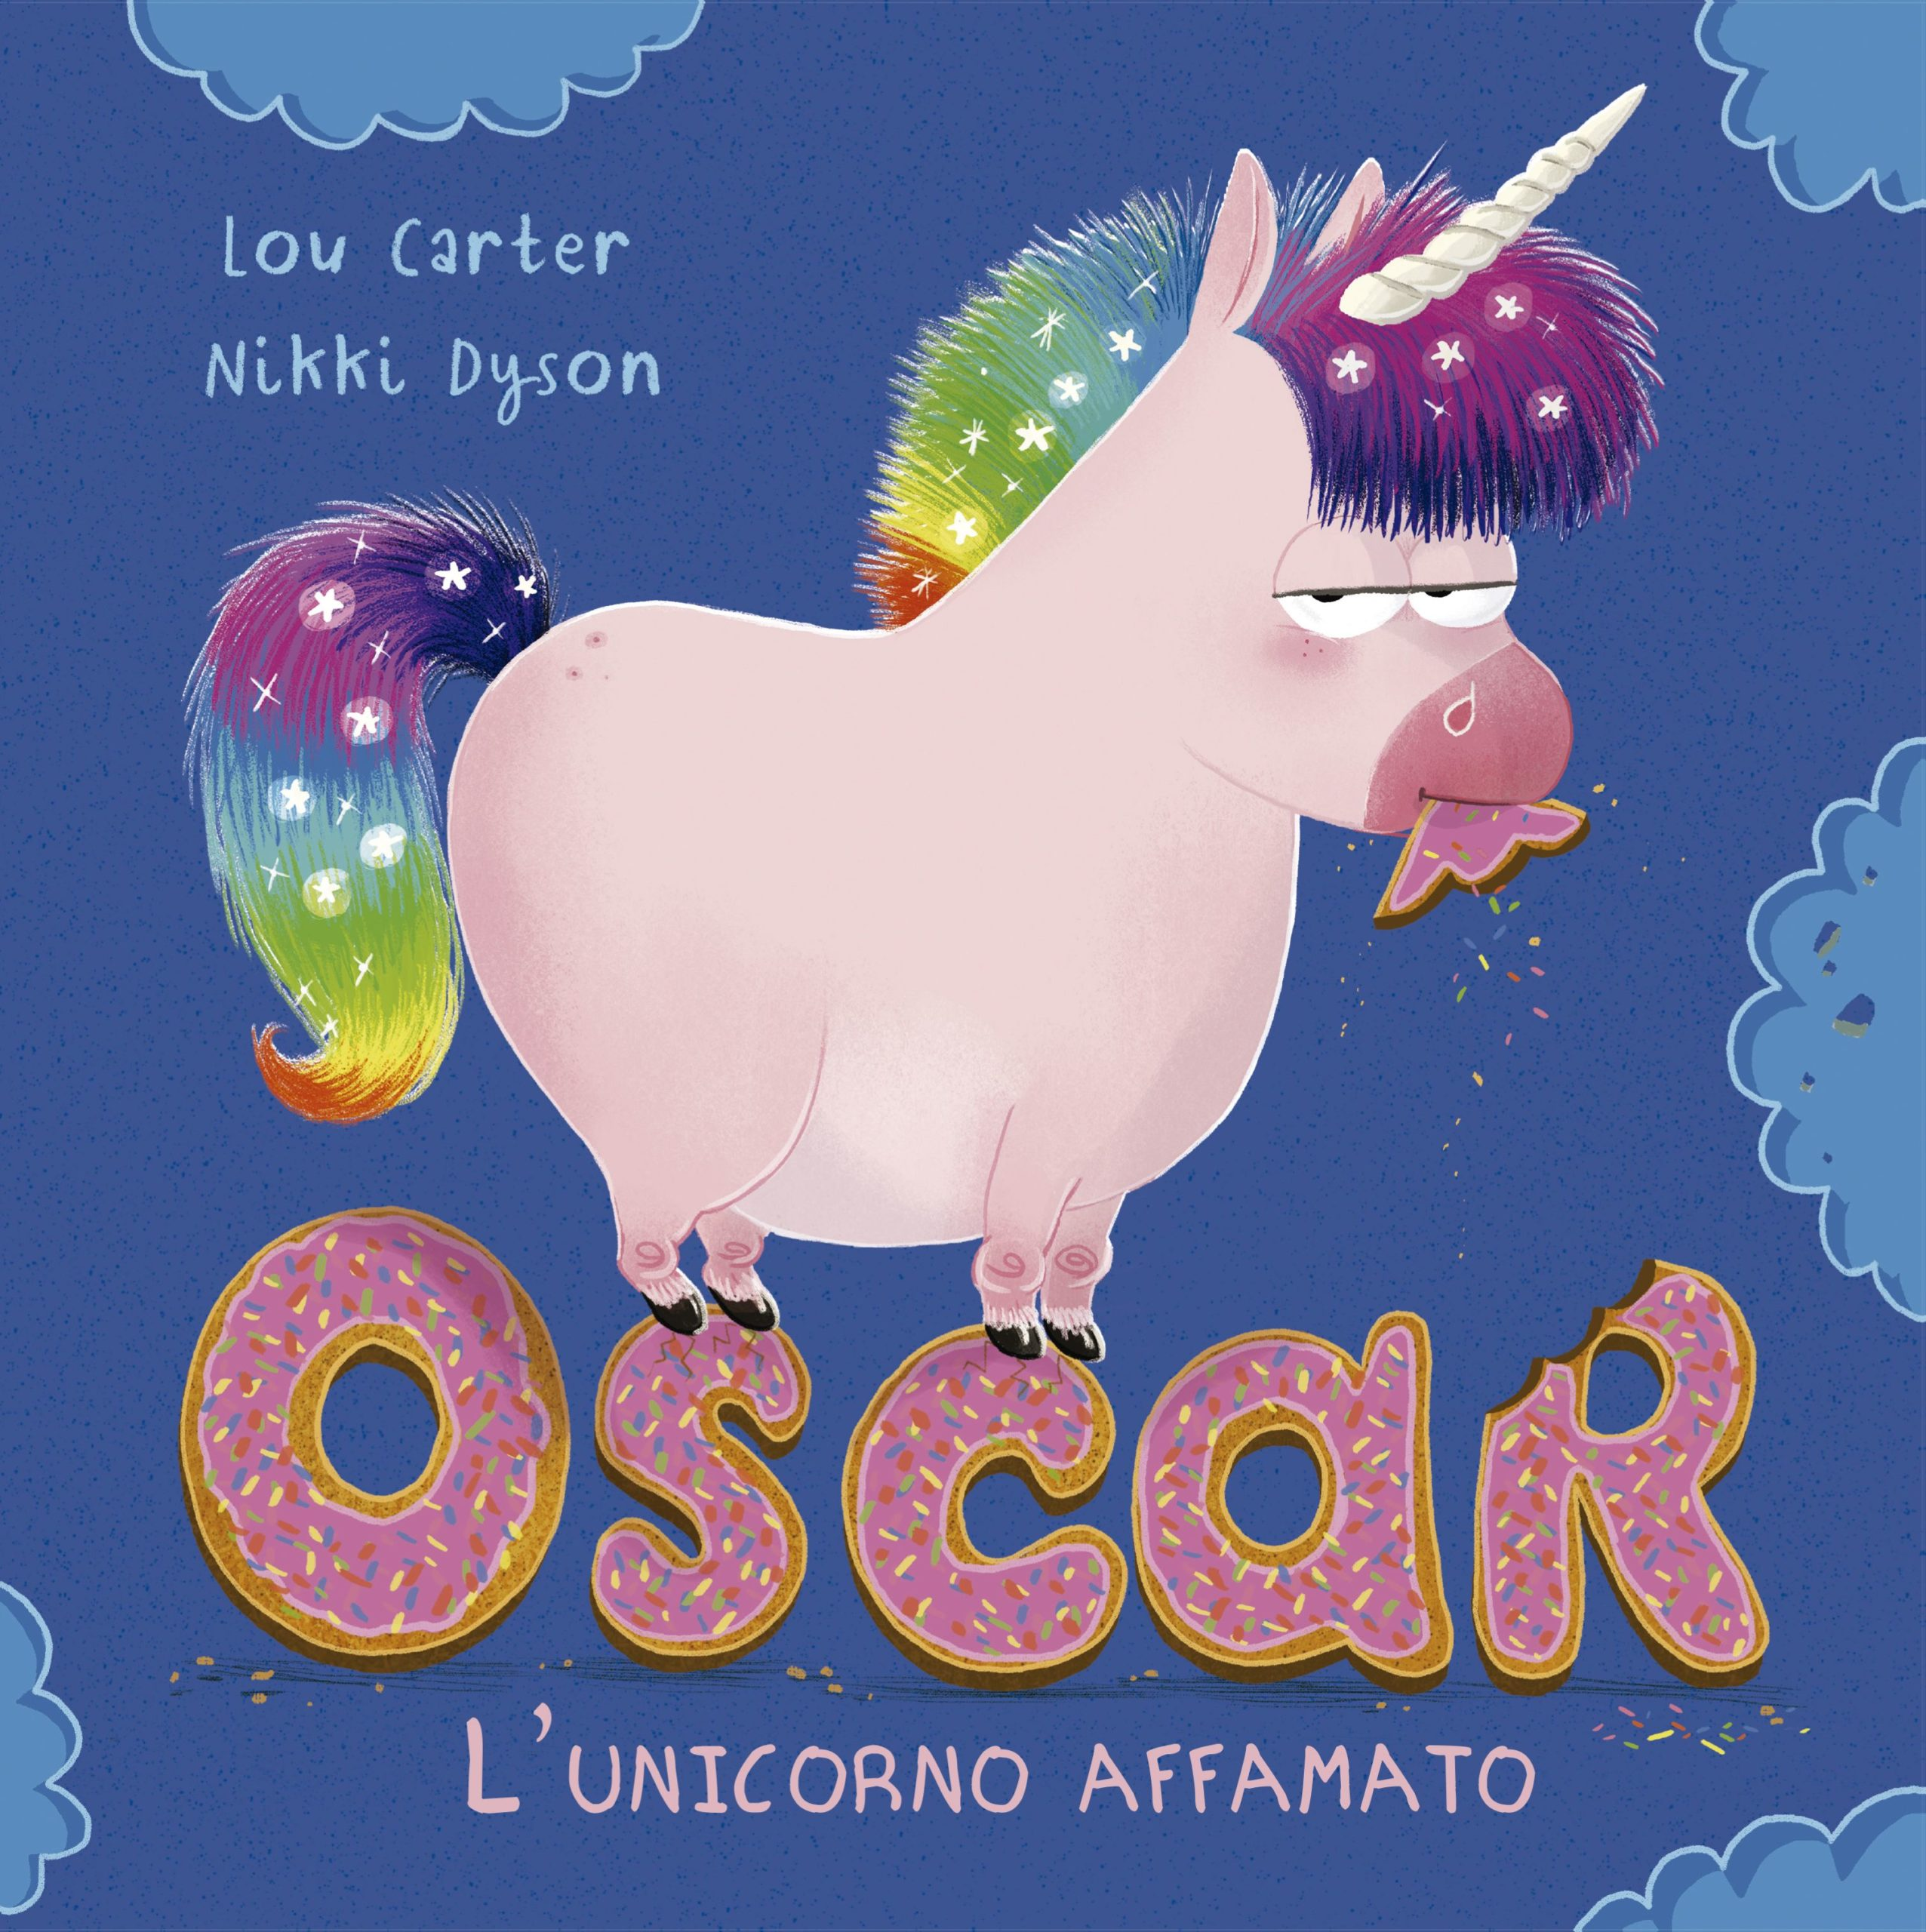 Oscar l'unicorno affamato